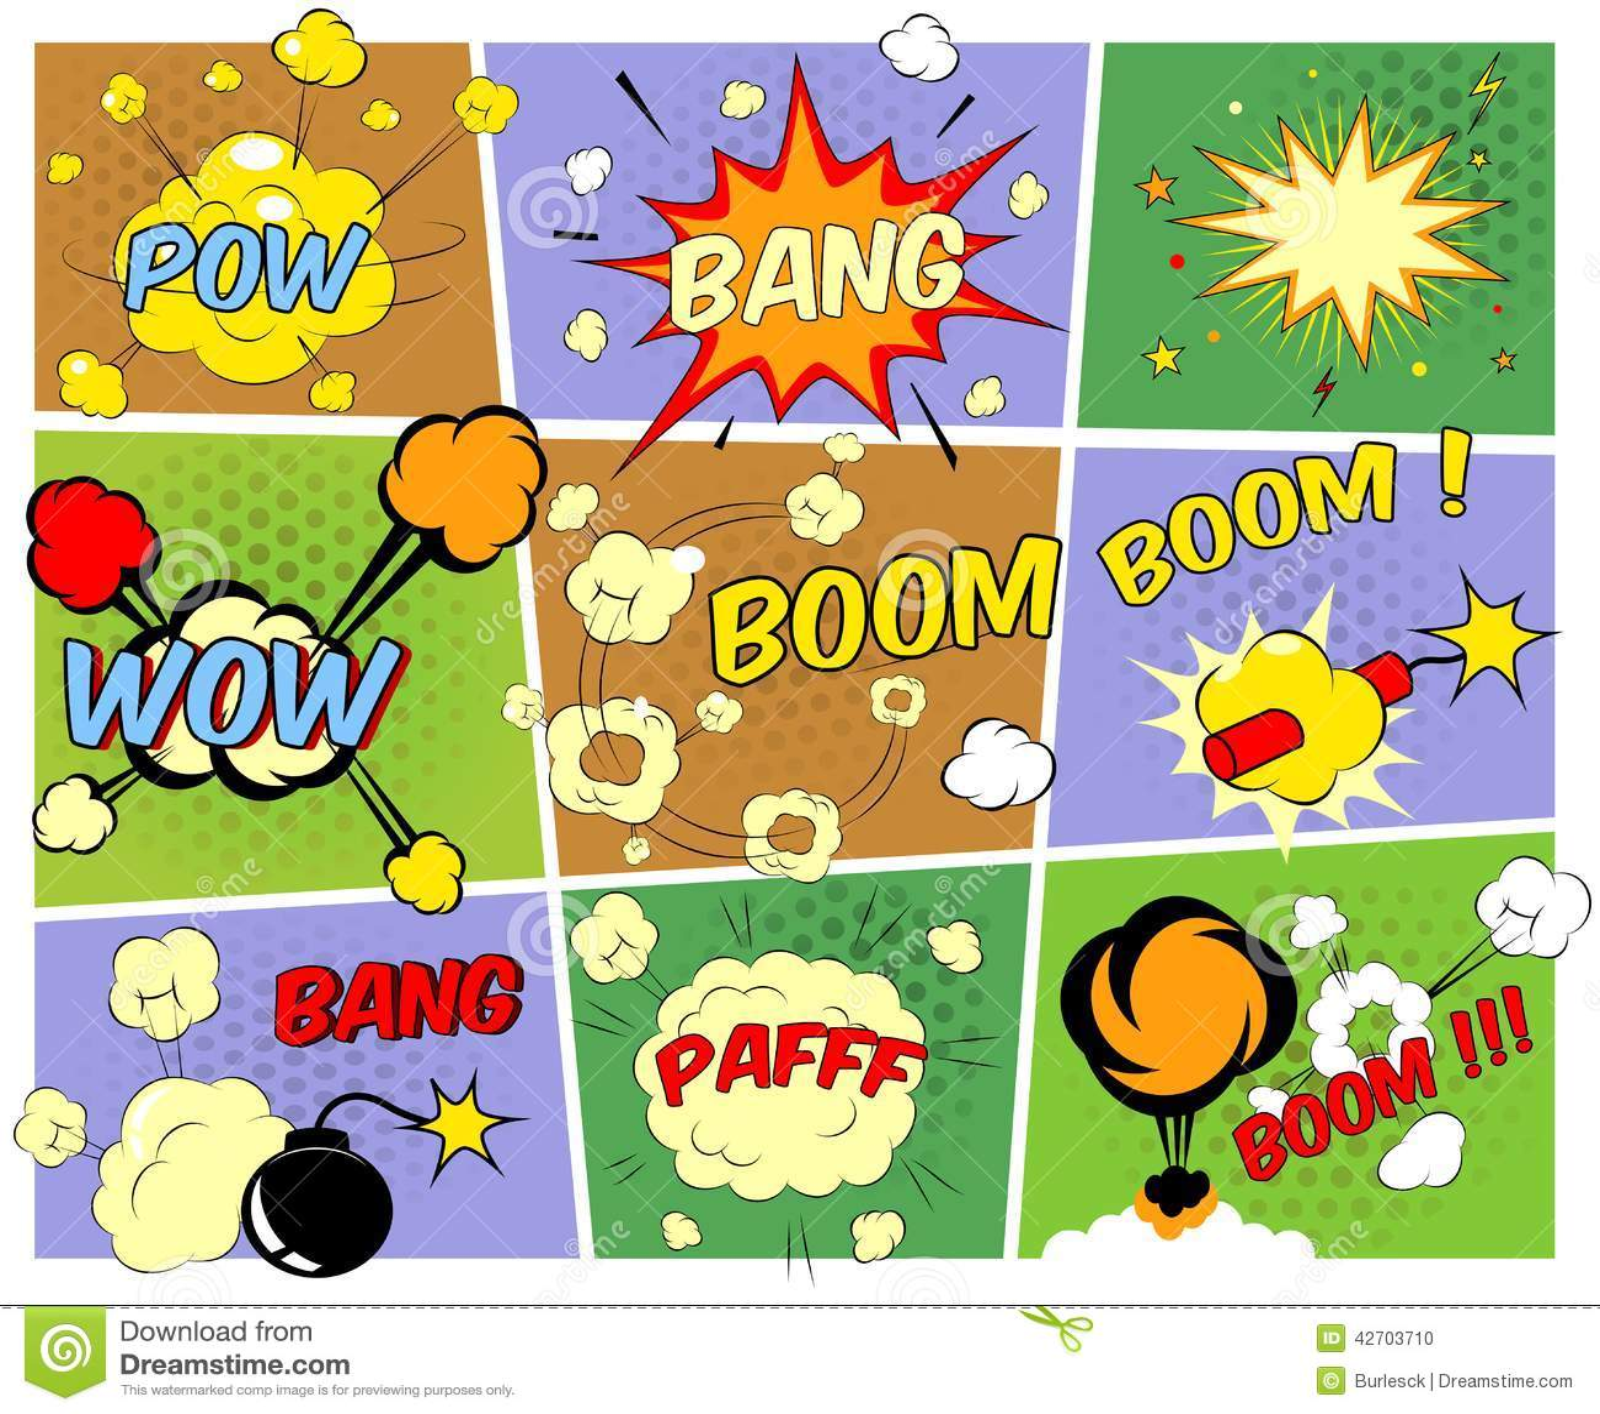 Mock-ups of comic book speech bubbles